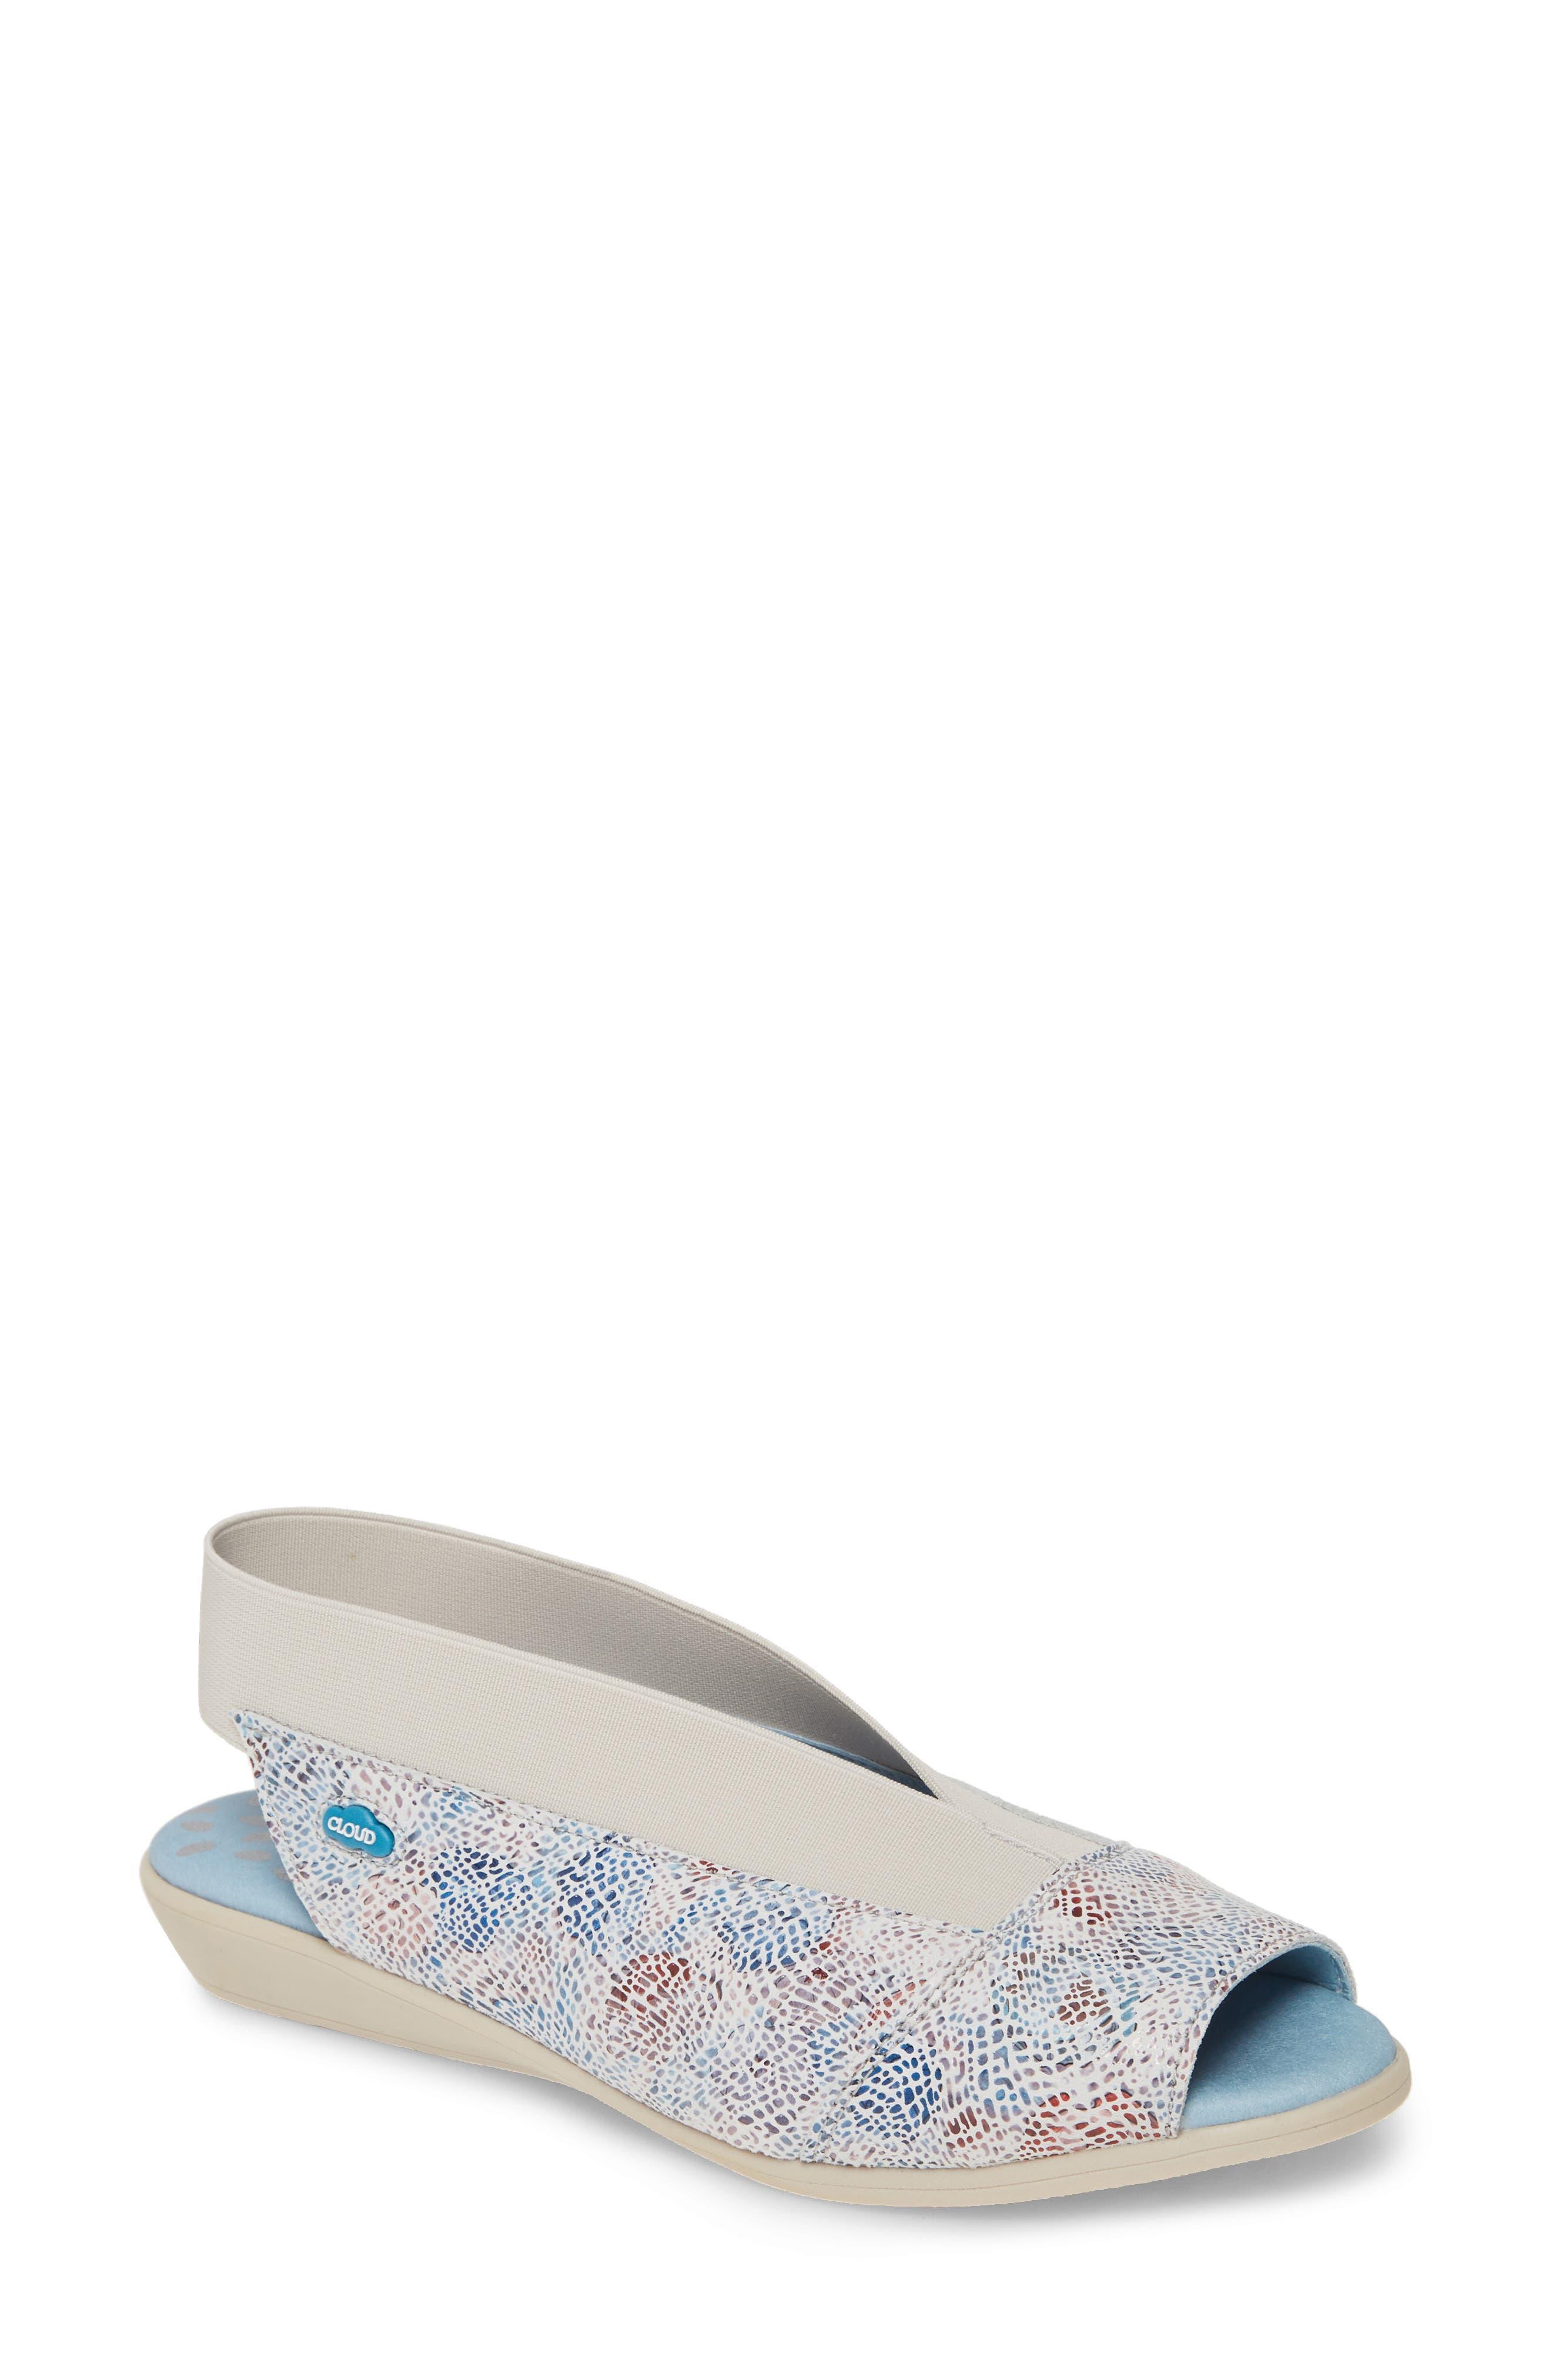 Caliber Slingback Sandal